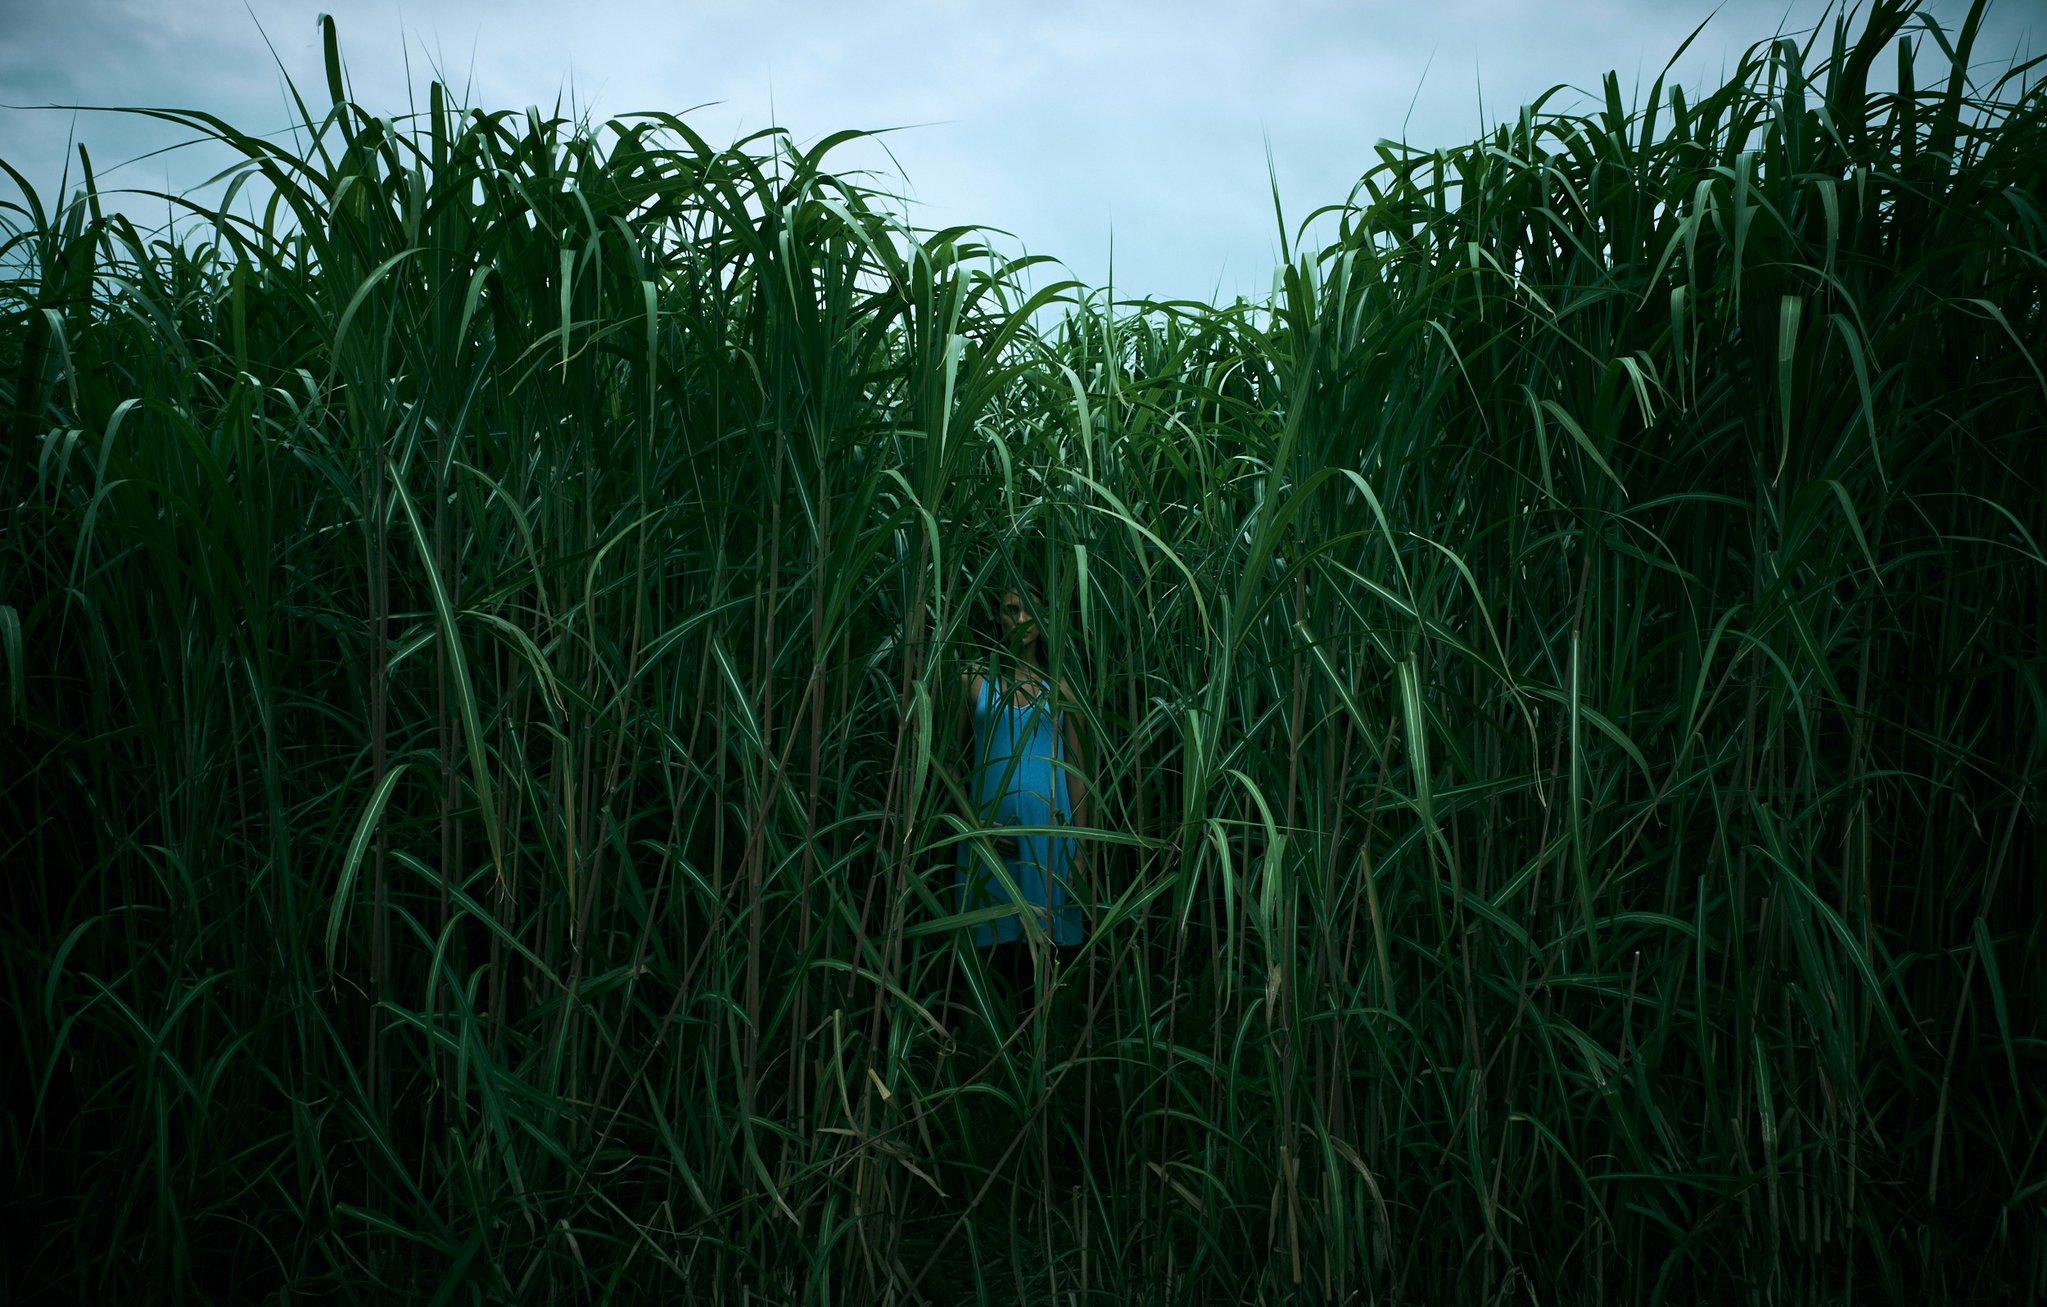 In The Tall Grass.jpg